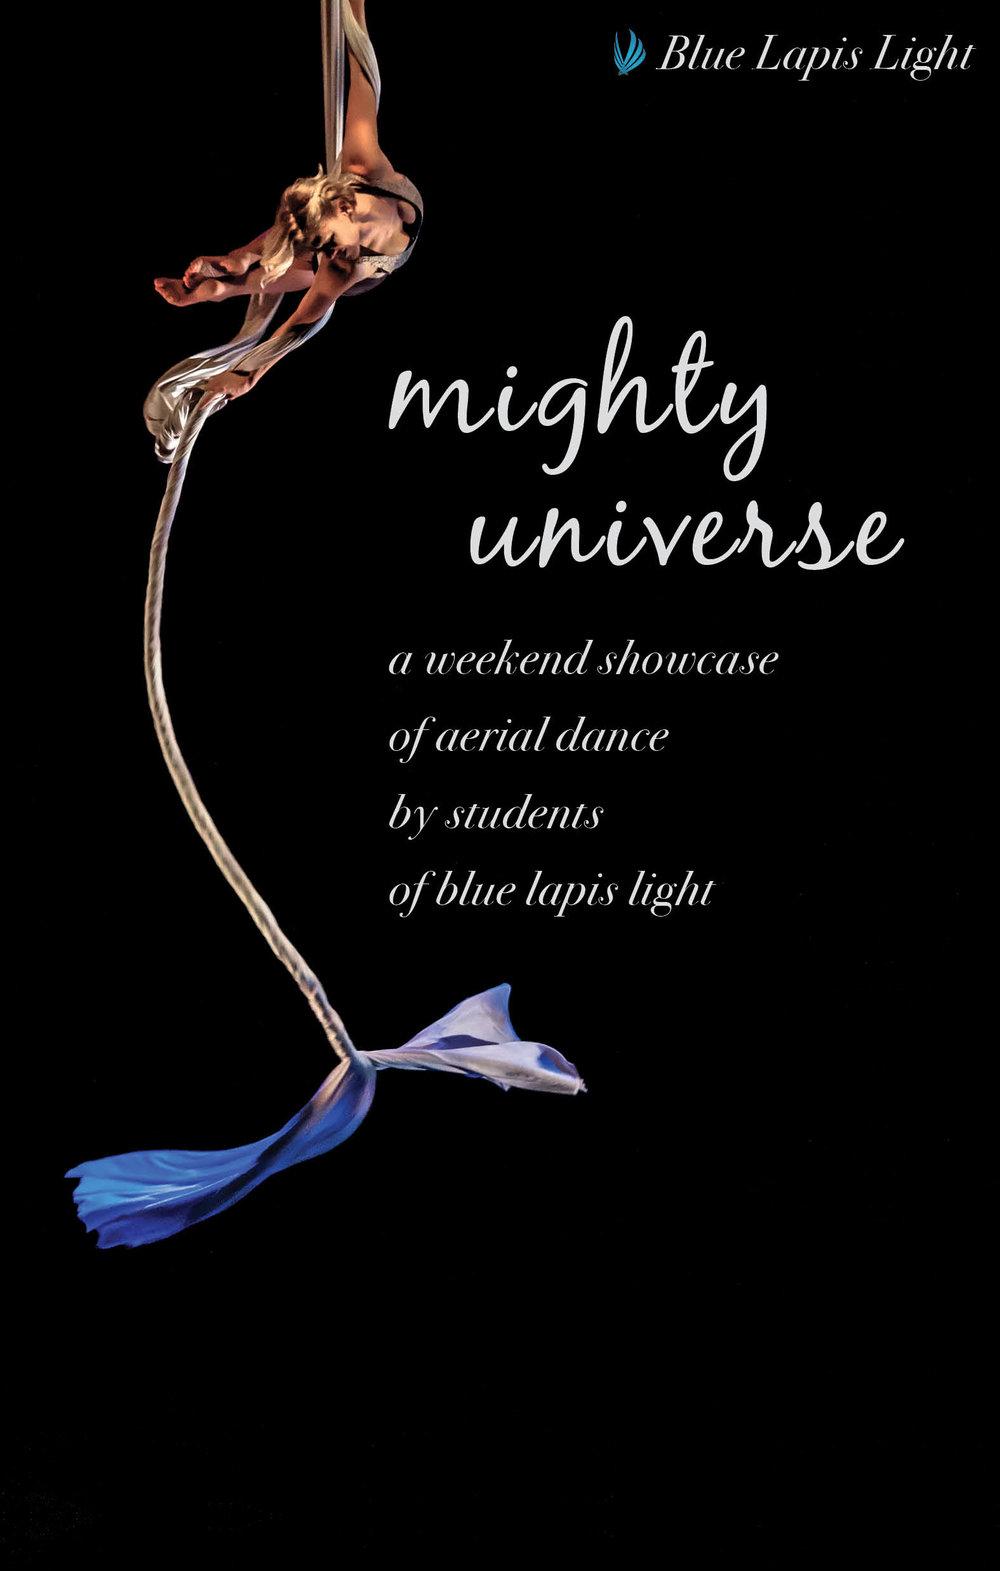 blue lapis light student showcase mighty universe.jpg